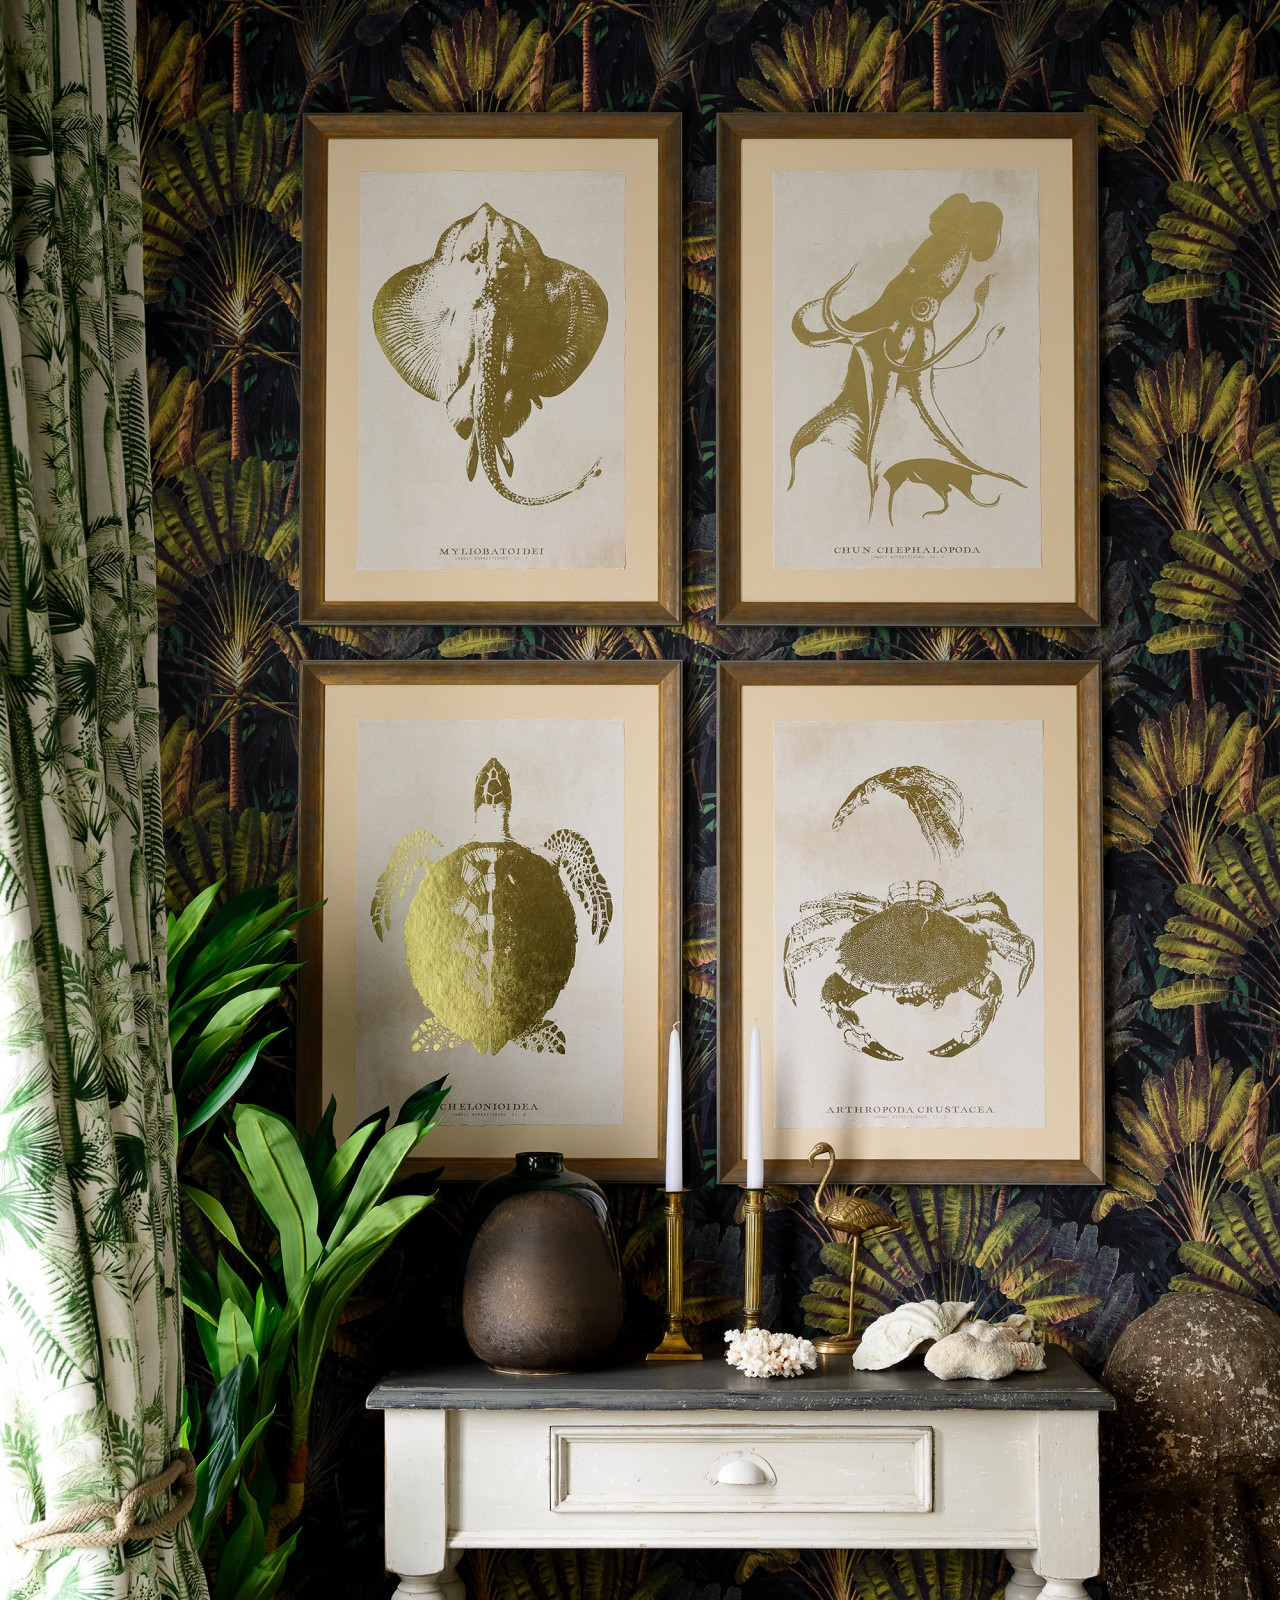 CARIBBEAN SEA LIFE - ARTHROPODA CRUSTACEA Framed Art